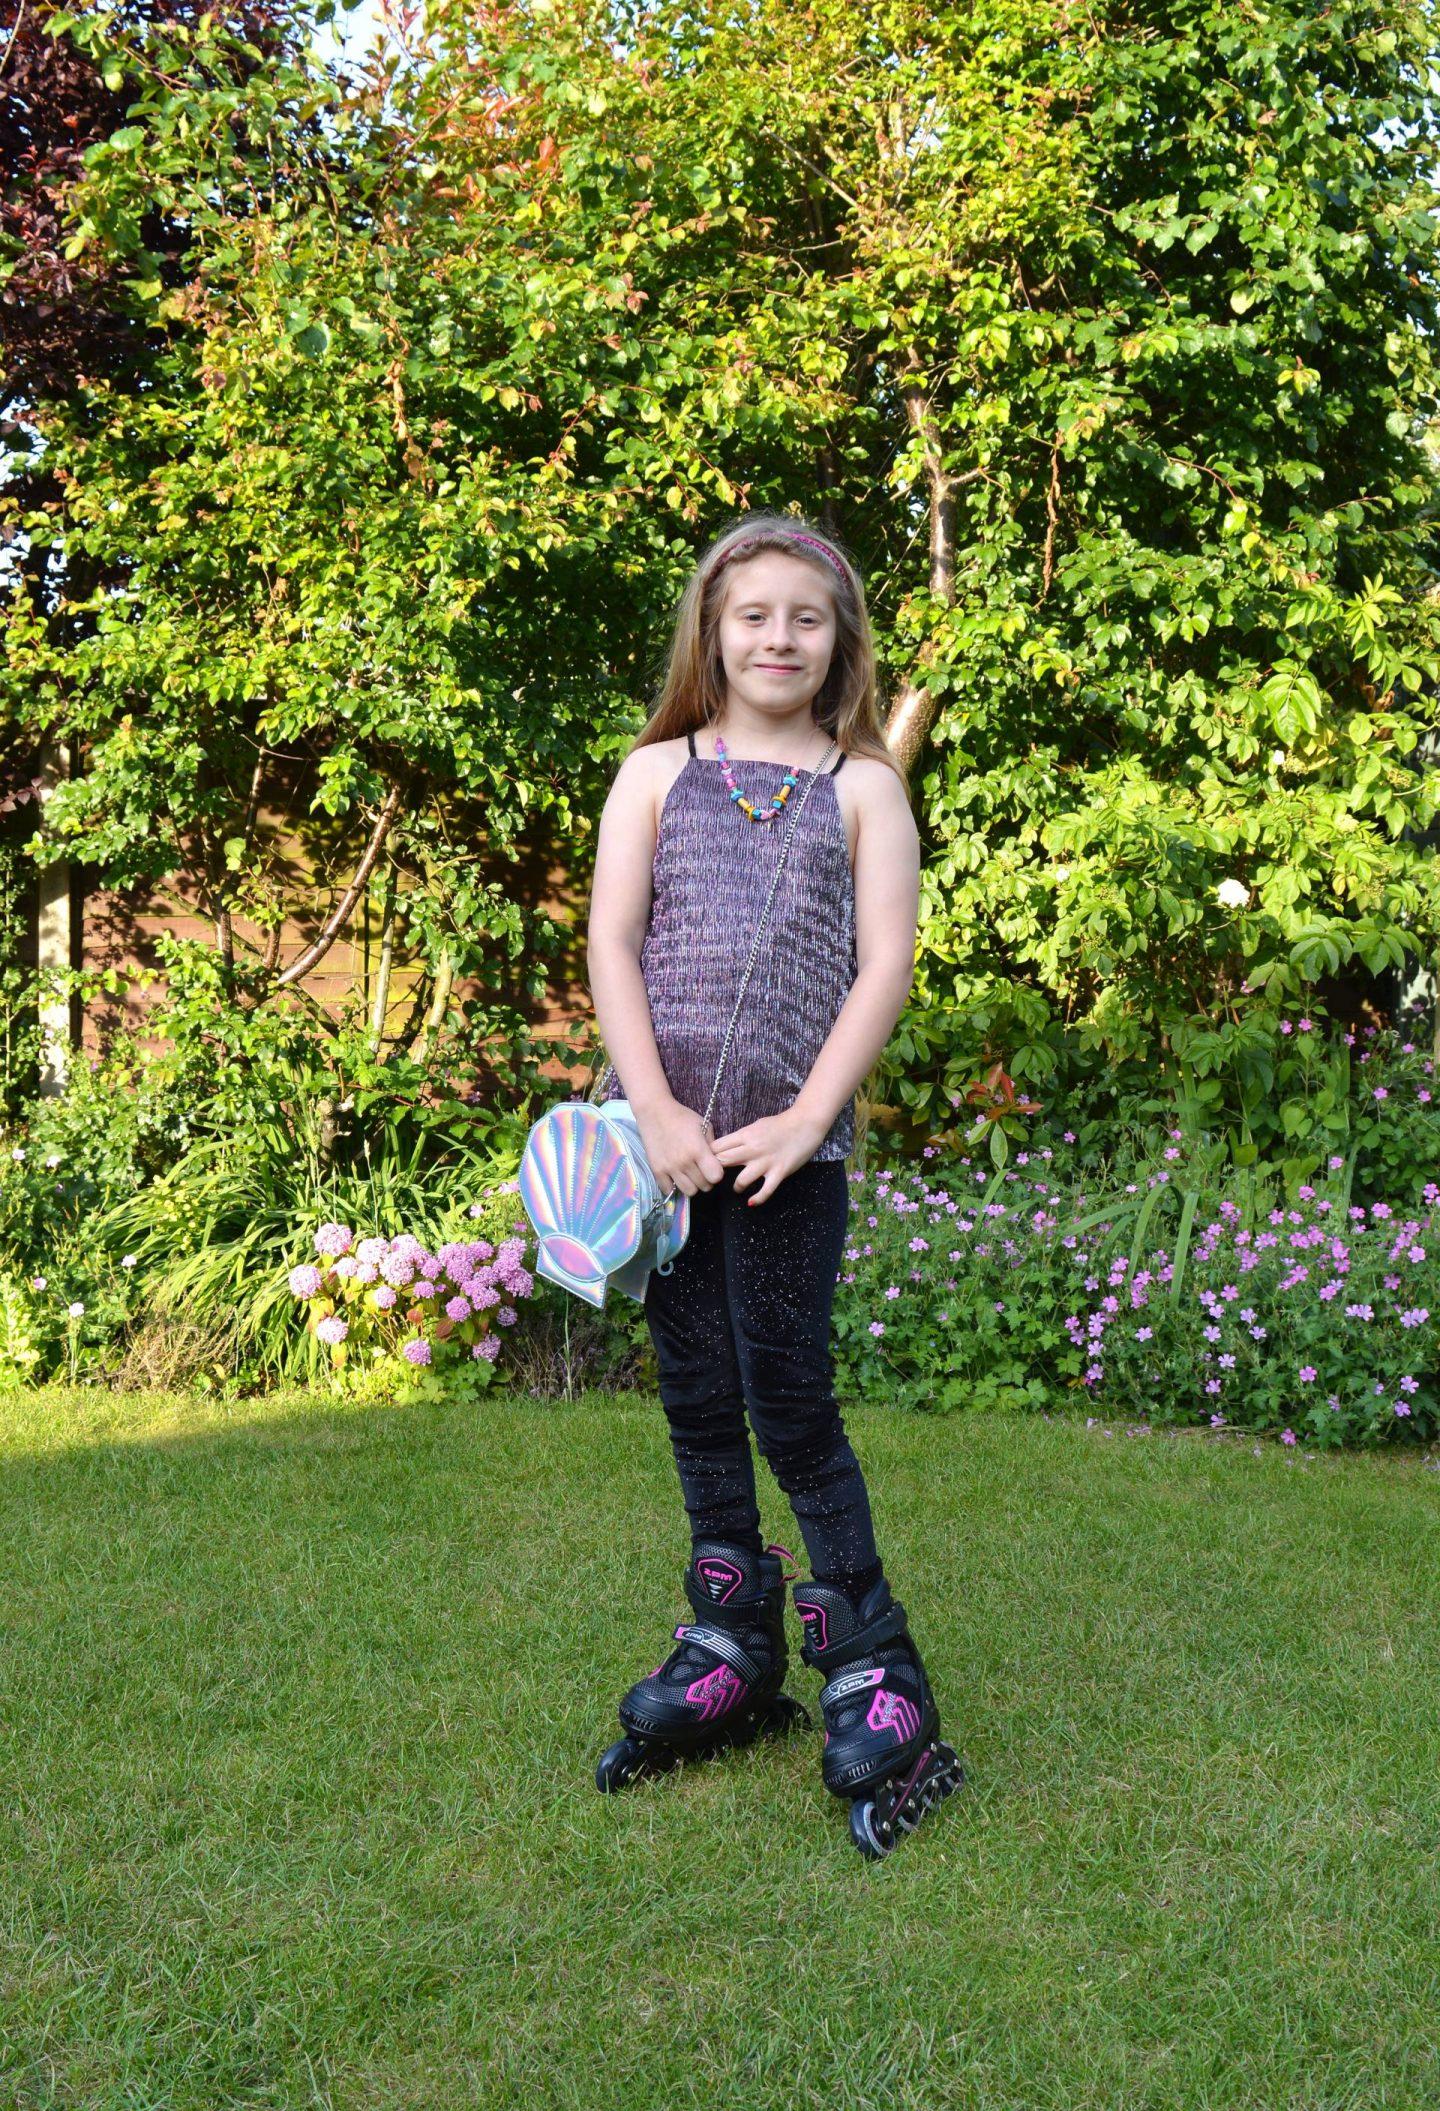 Isobel's 10th birthday